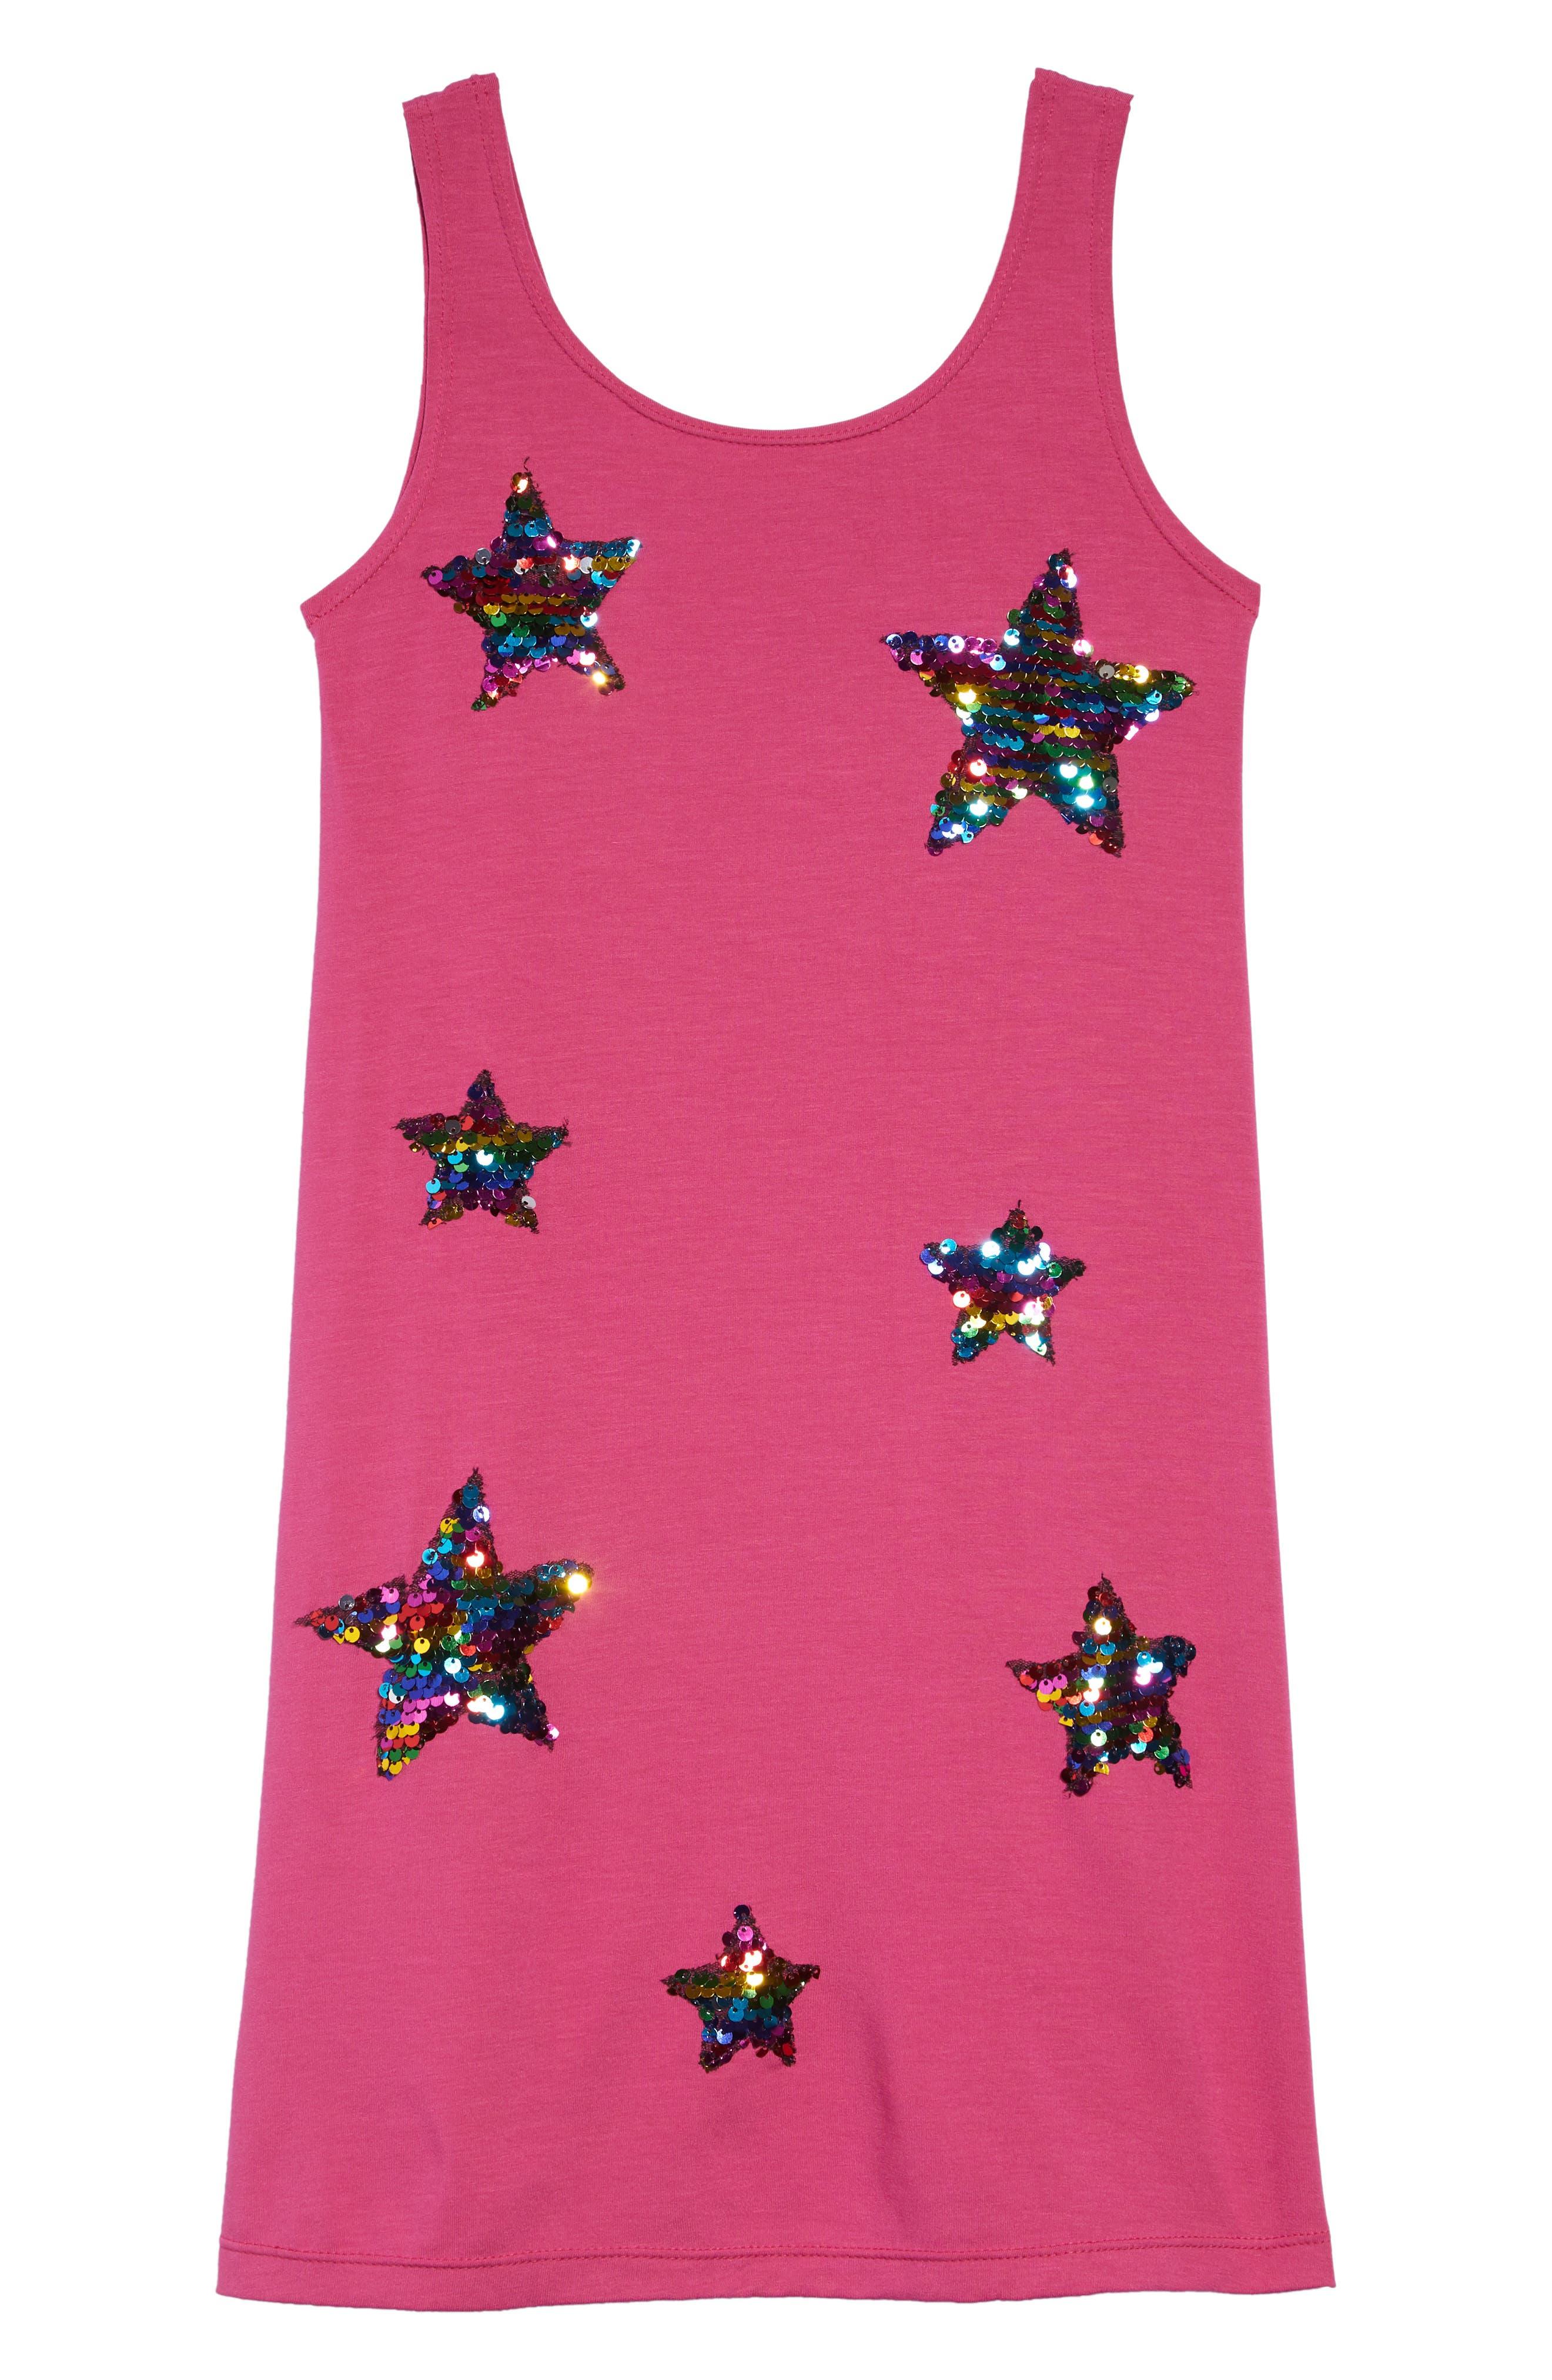 Girls Flowers By Zoe Sequin Stars Sleeveless Shift Dress Size M (8)  Pink